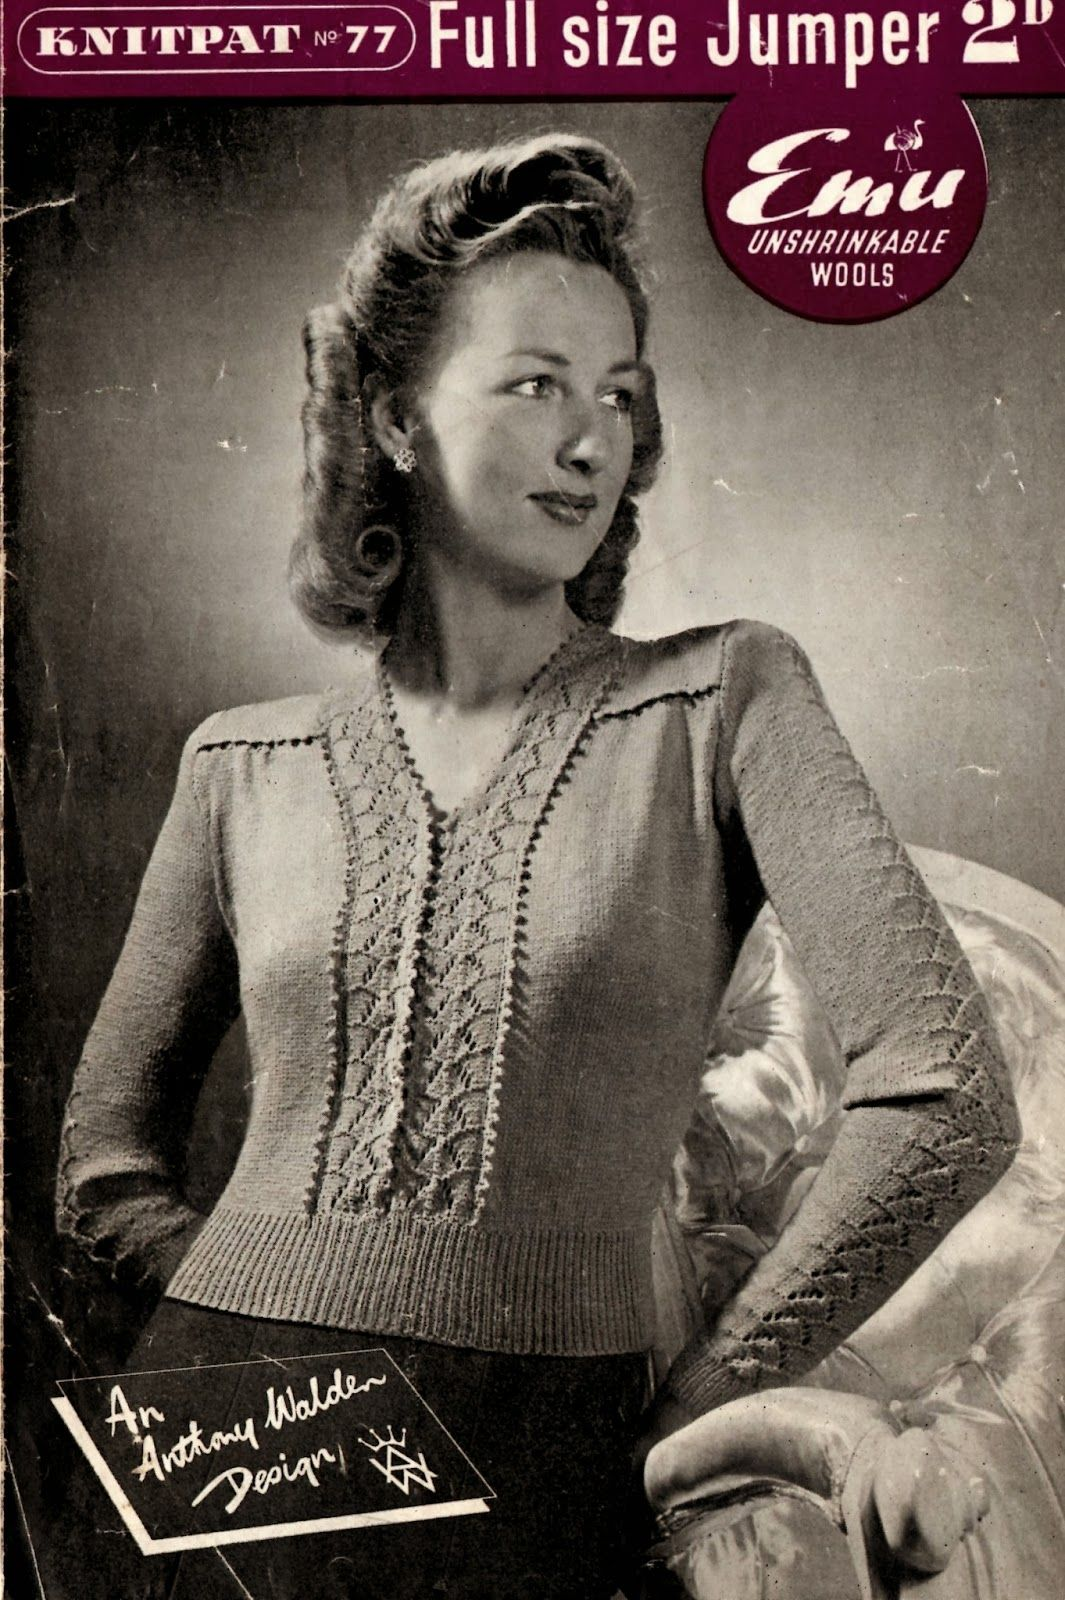 245fb9fe3 Free Knitting Pattern - 1940 s larger size jumper - Knitpat 77 ...